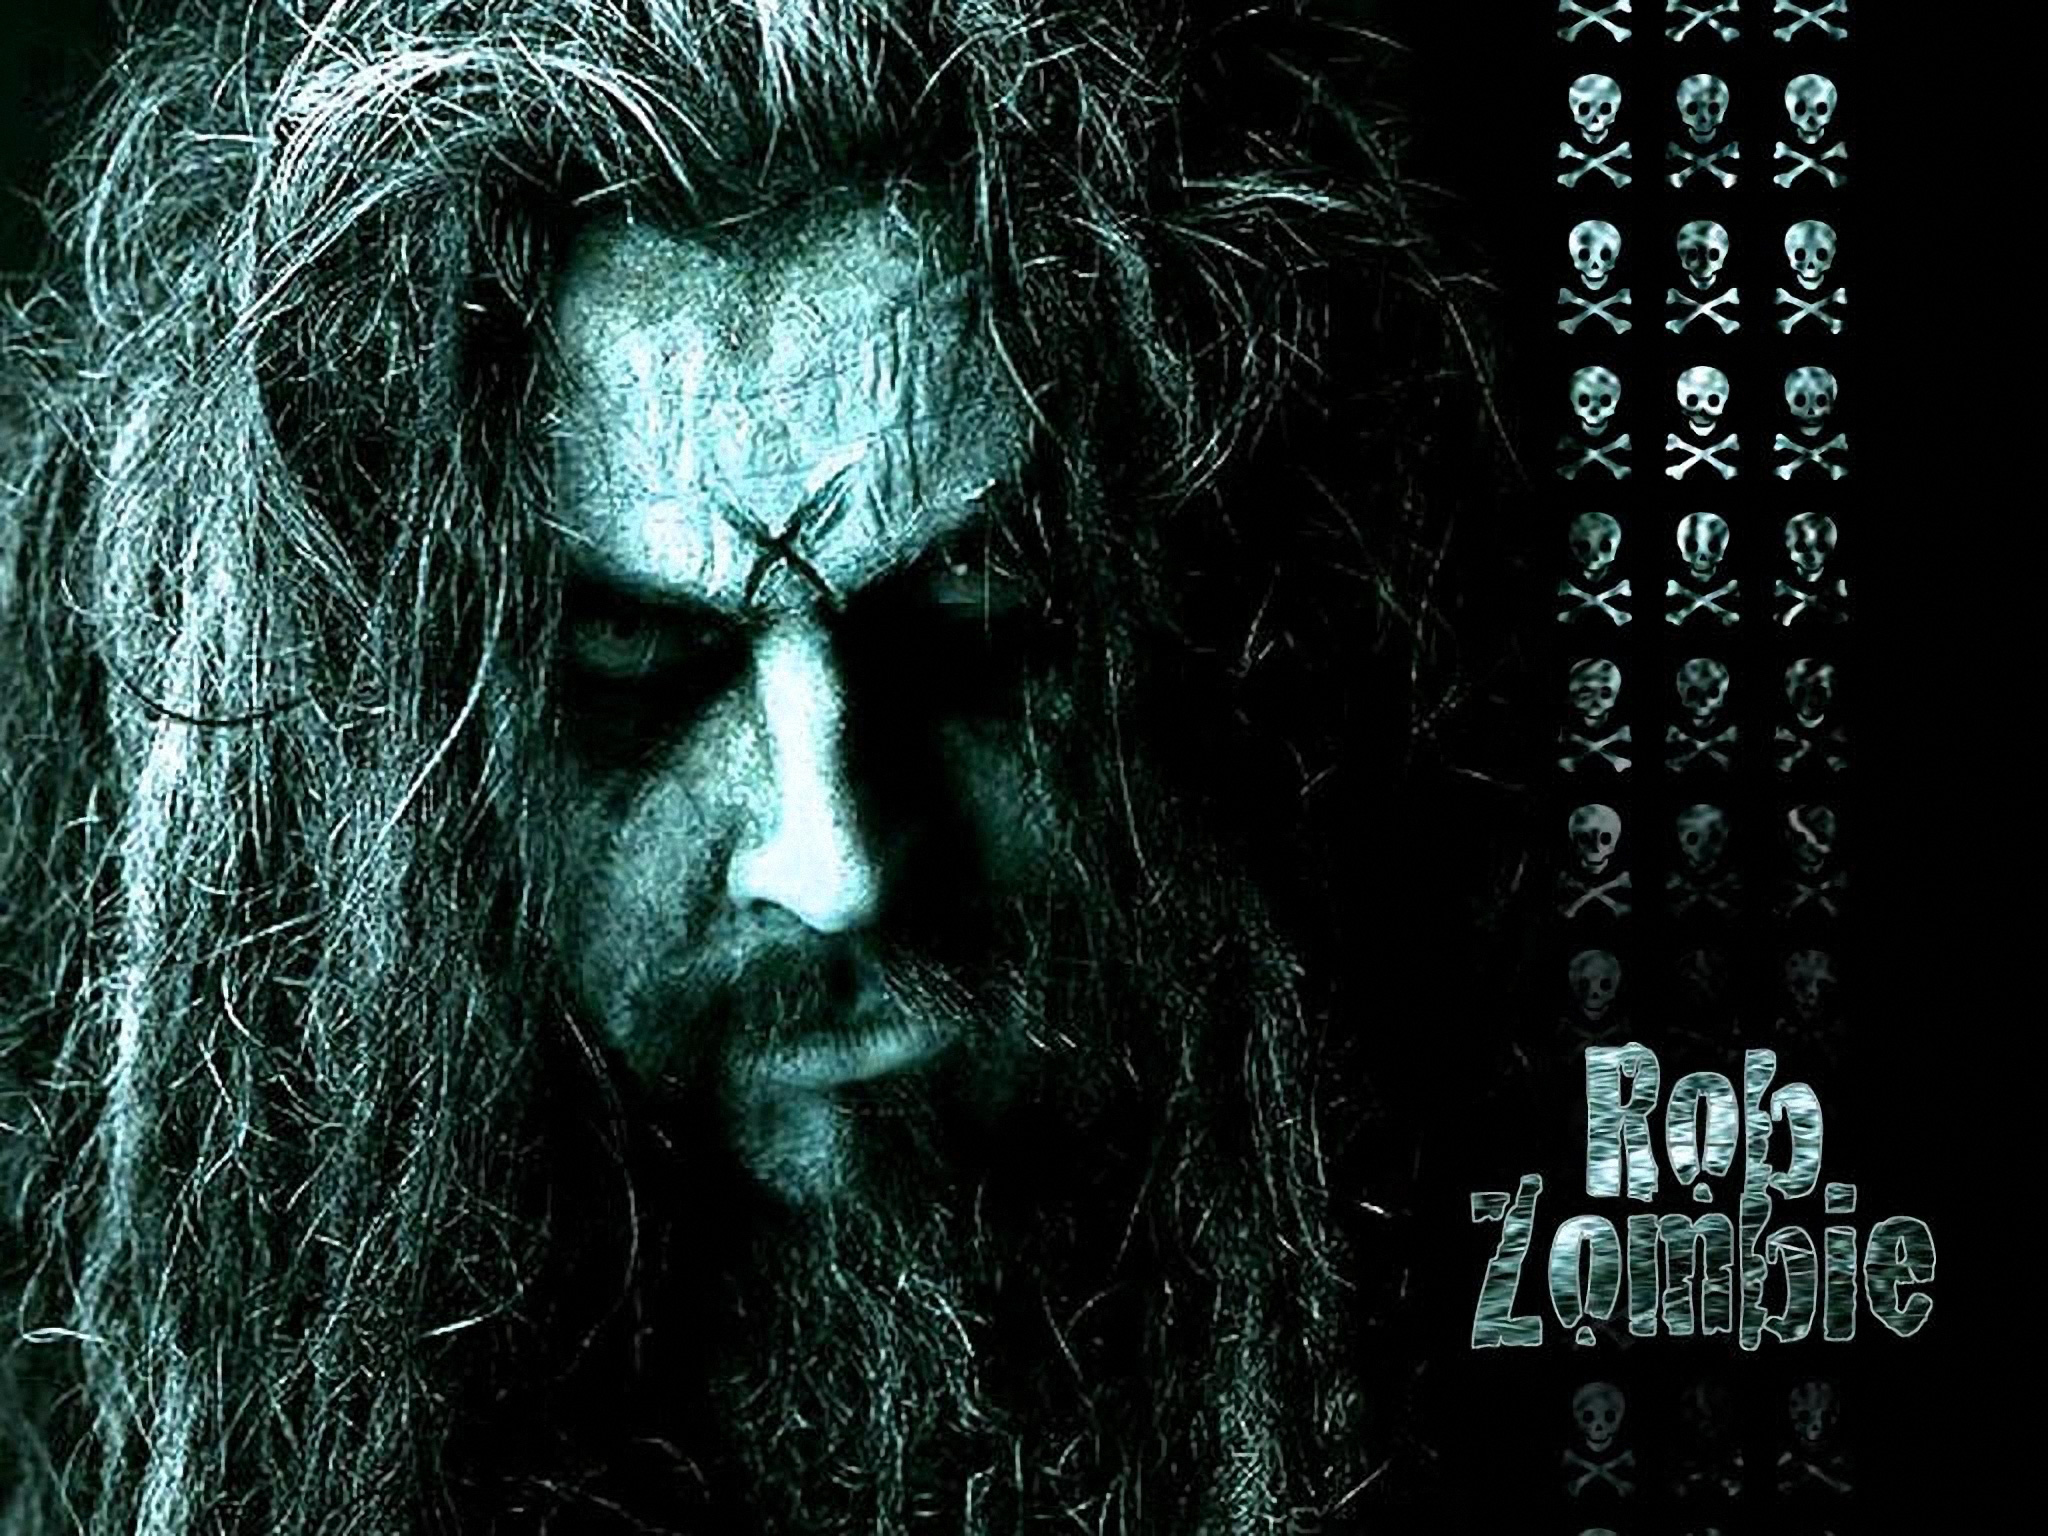 2048x1536 Music Rob Zombie